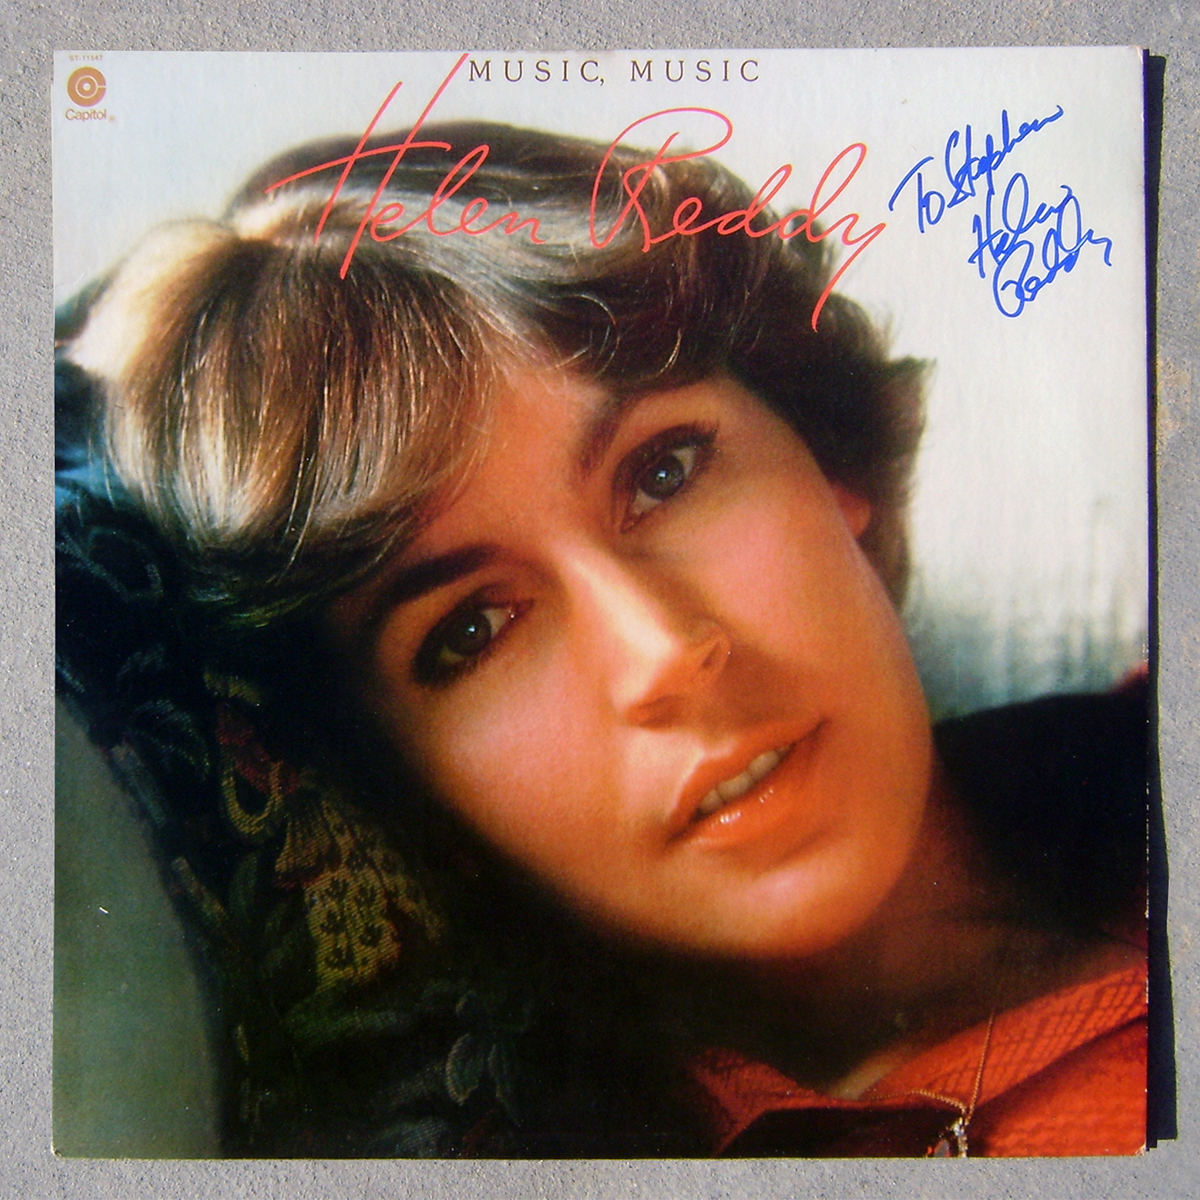 LP - Helen Reddy - Music, Music